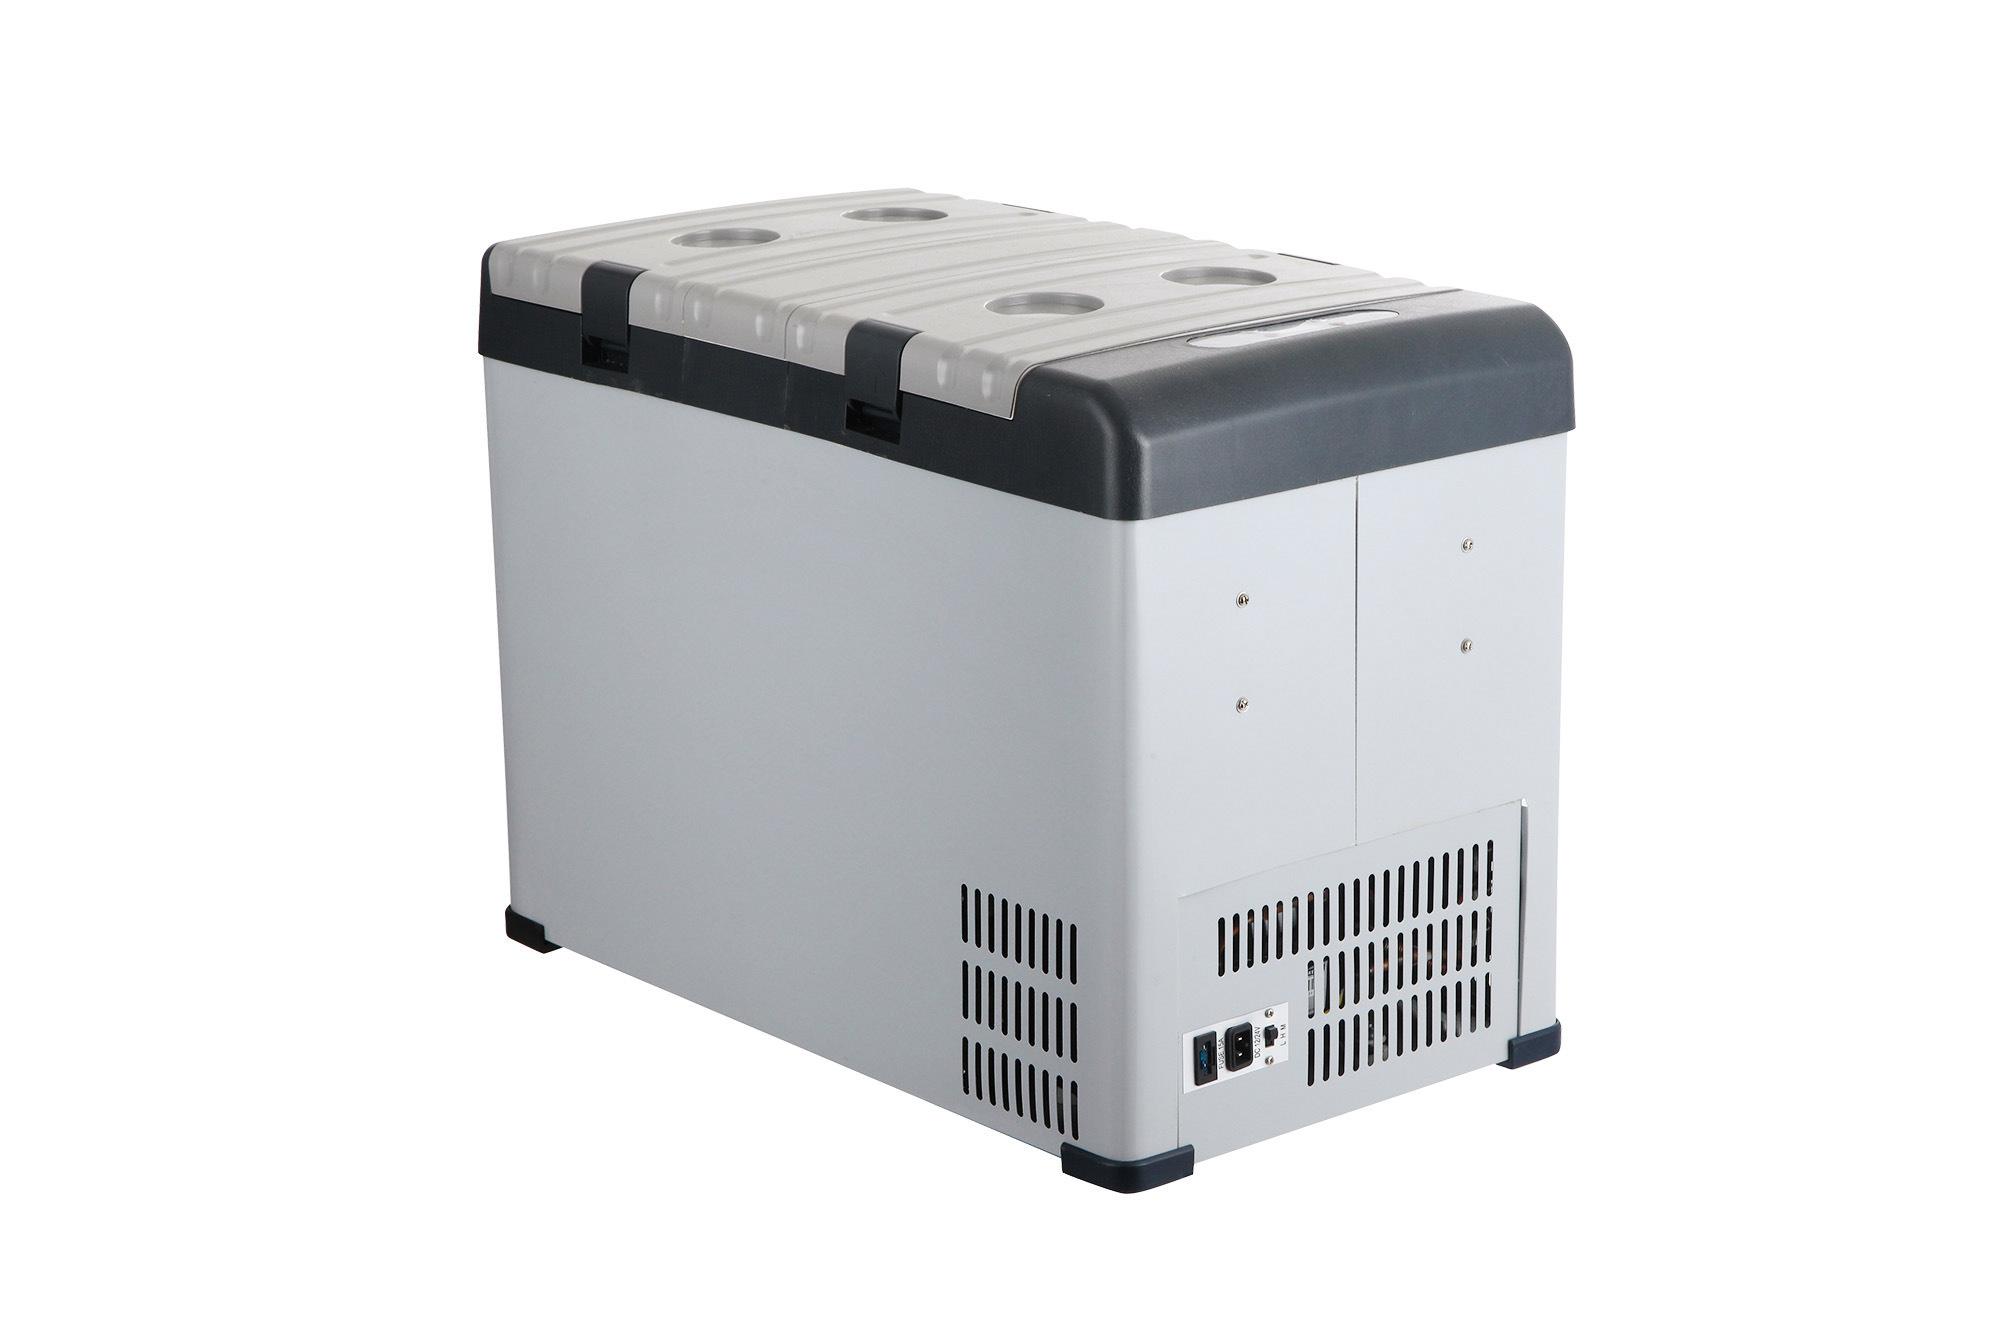 Innovative DC Compressor Refrigerator 42liter DC12/24V with AC Adaptor (100-240V) Both Used in Car or at Home